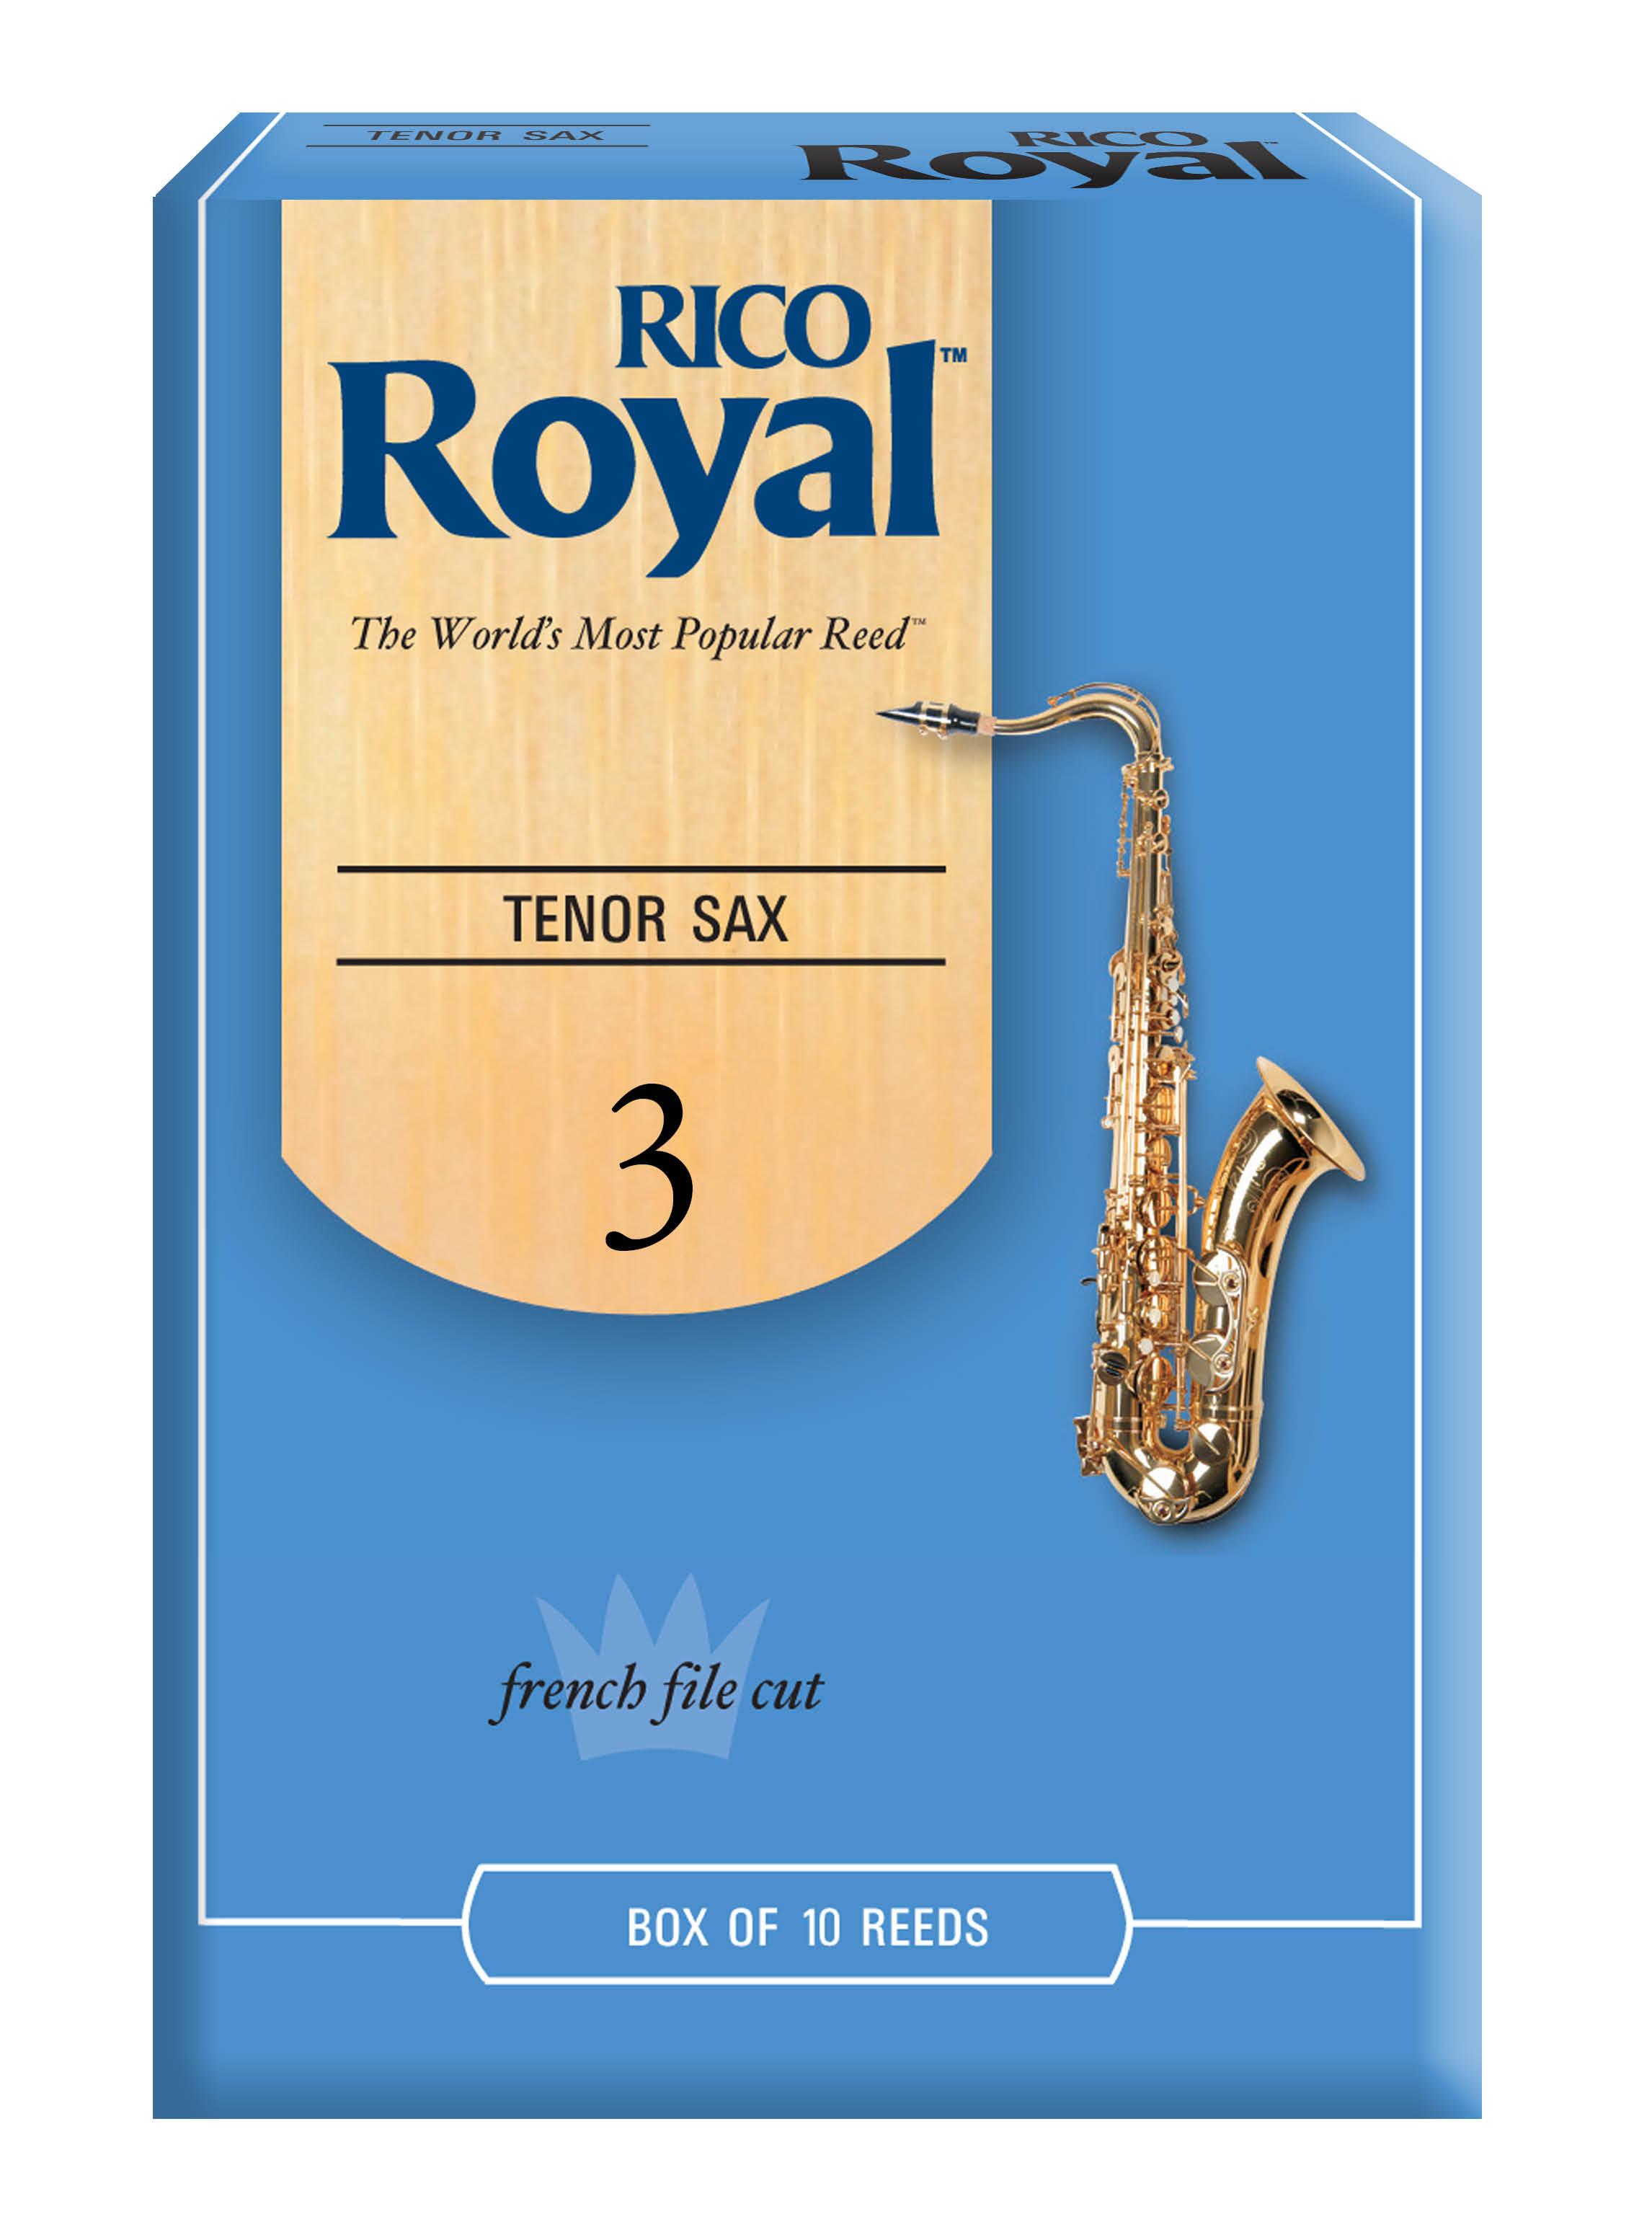 RICO ROYAL 3 TEN SAX REEDS 10